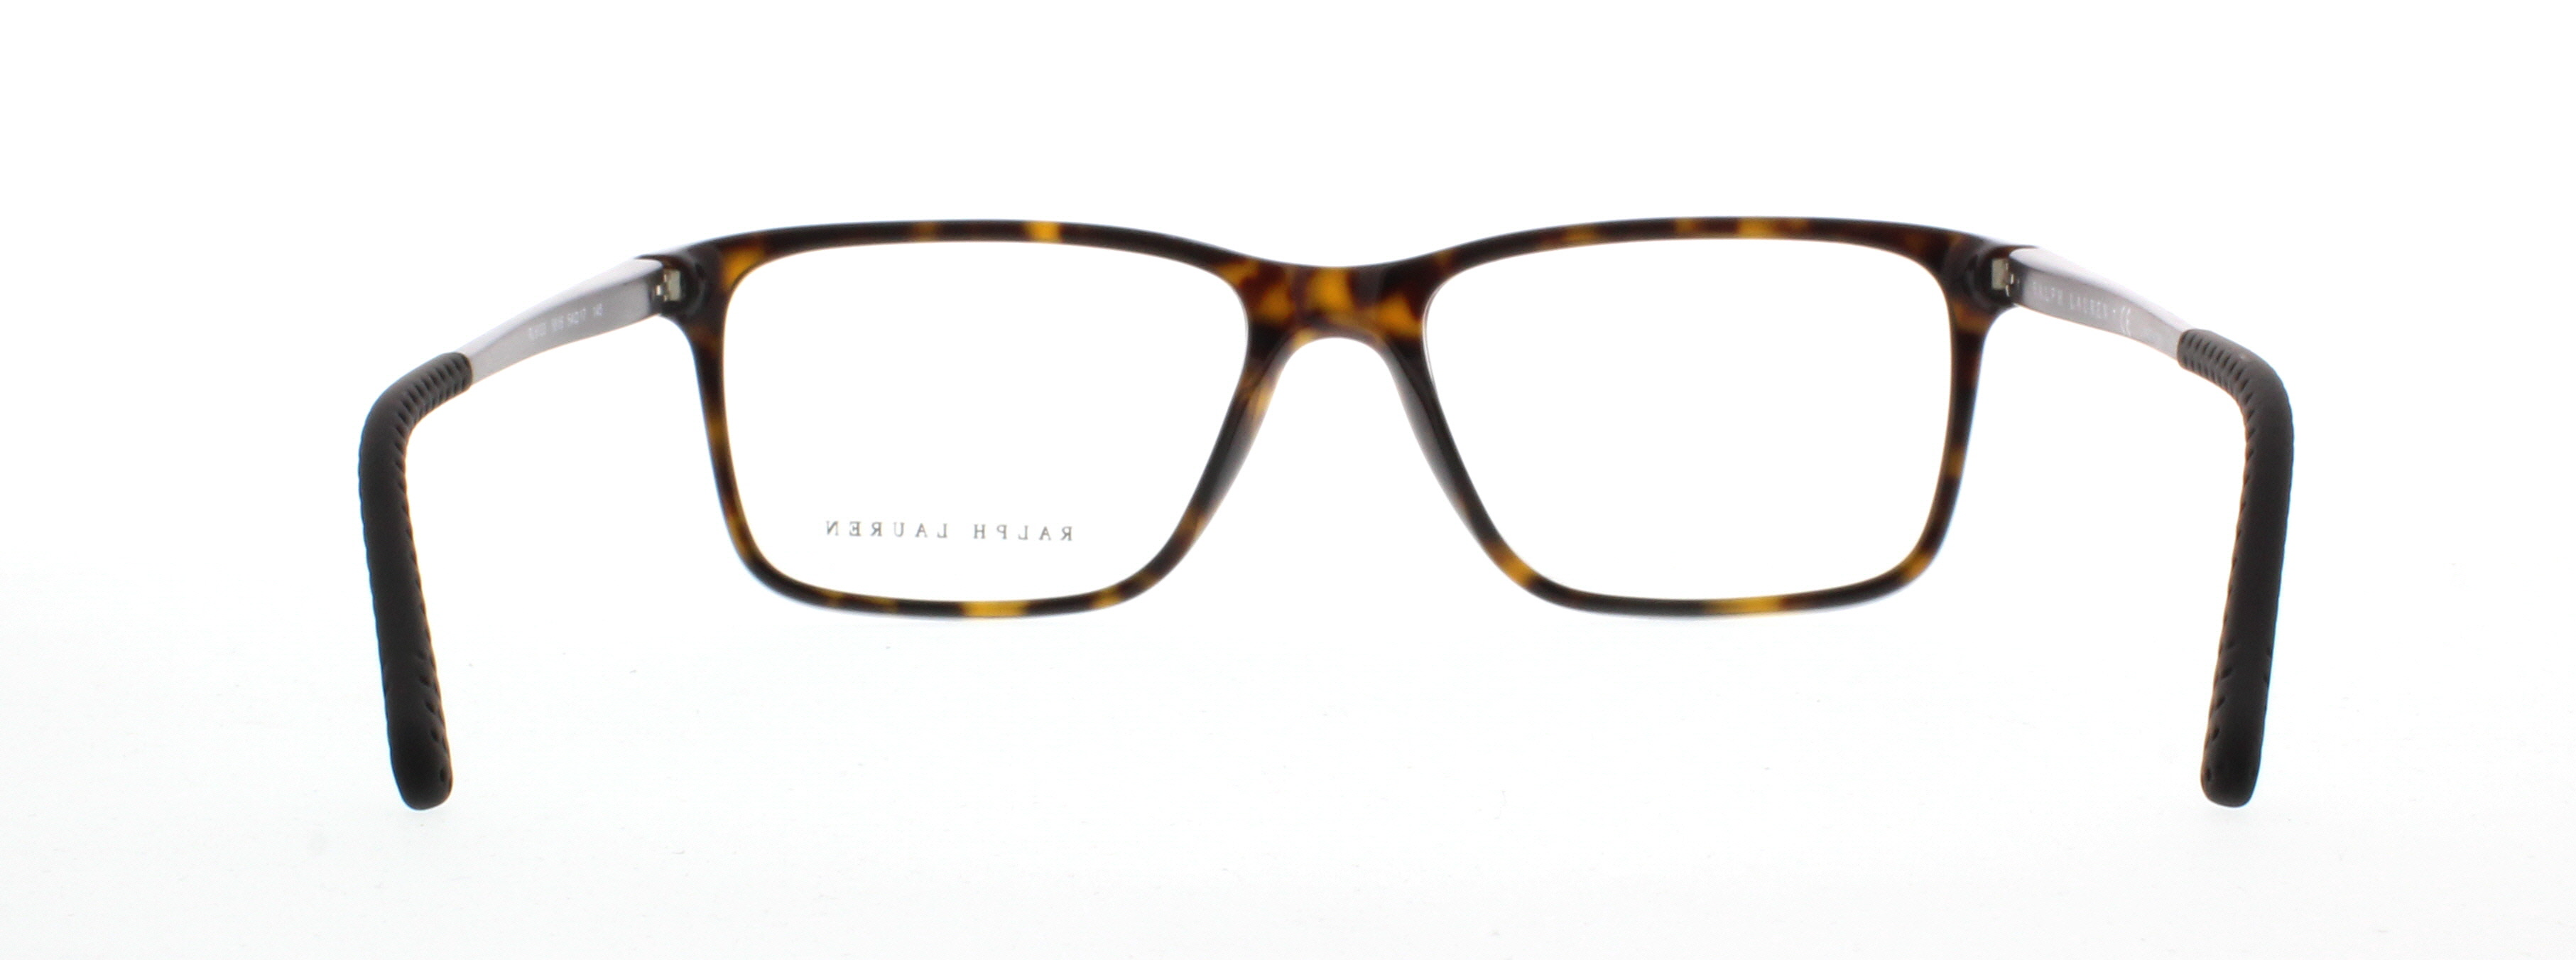 9ad52d3be7a Designer Frames Outlet. Ralph Lauren RL6133